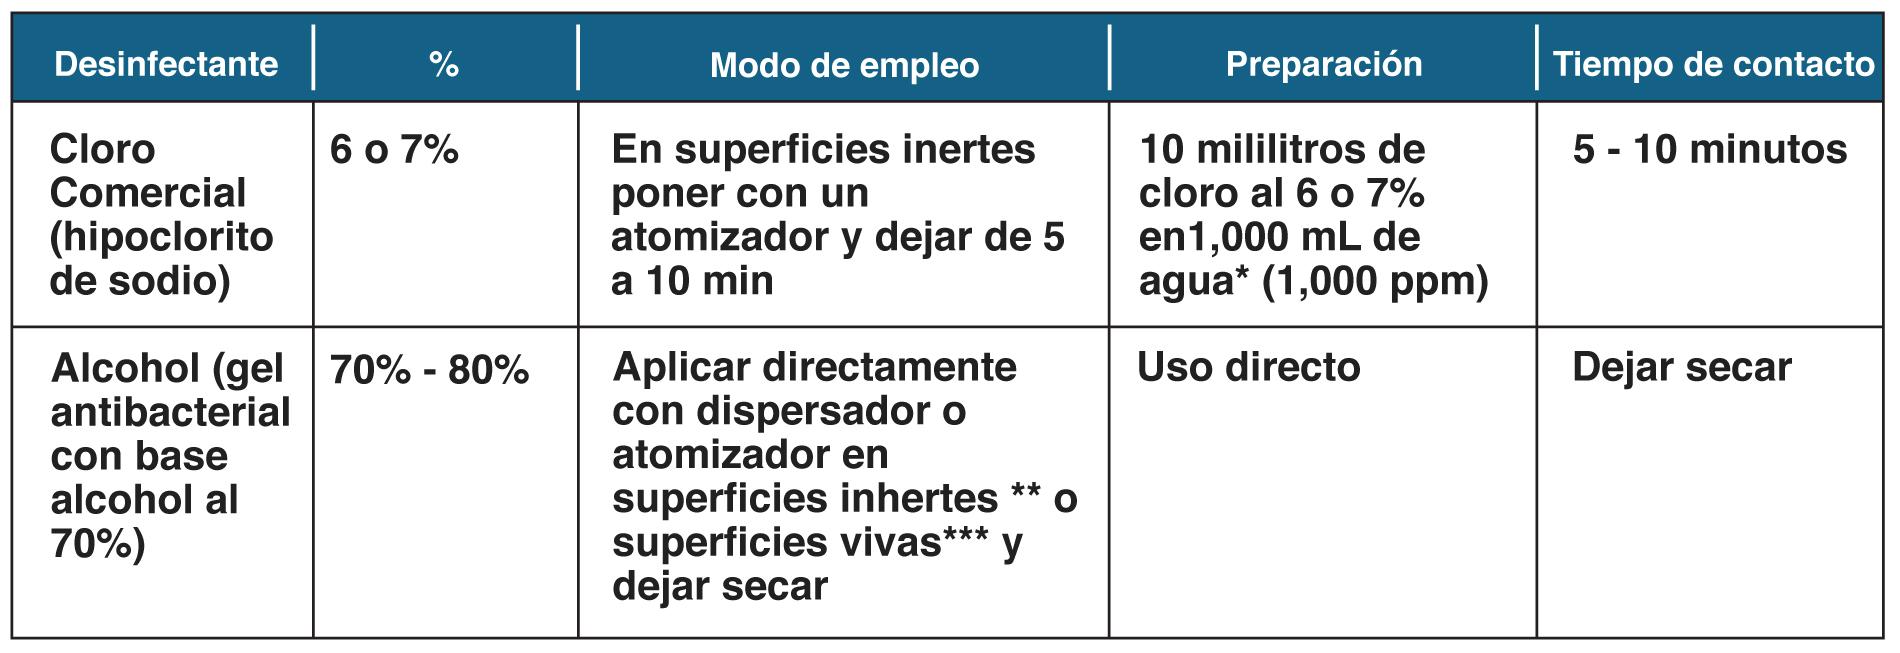 tabala desinfeccion covid-19 [object object] Protocolo de COVID-19 en consultorio tabala desinfeccion covid19